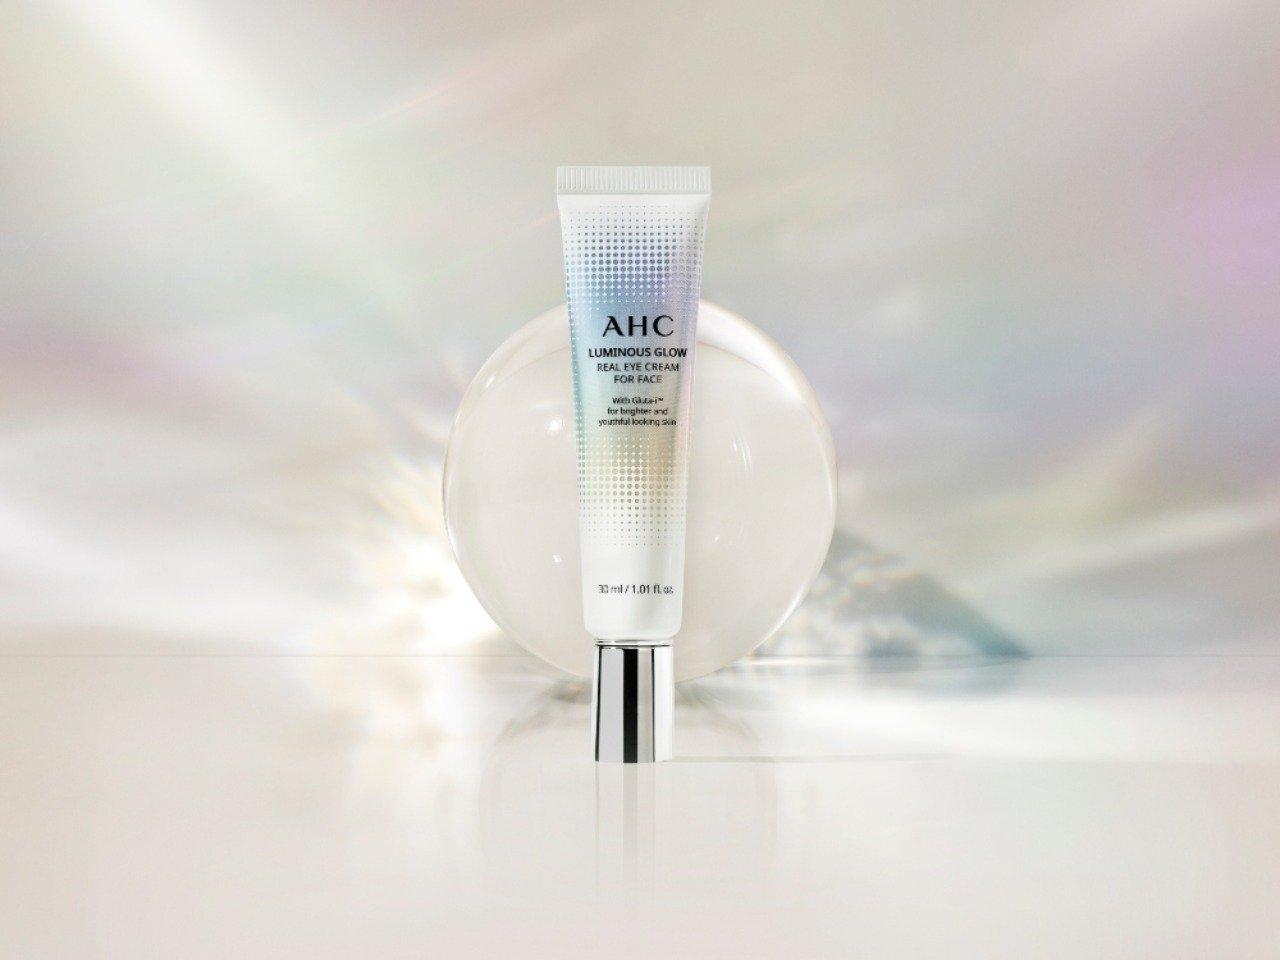 AHC Luminous Glow Real Eye Cream. Foto: PR AHC